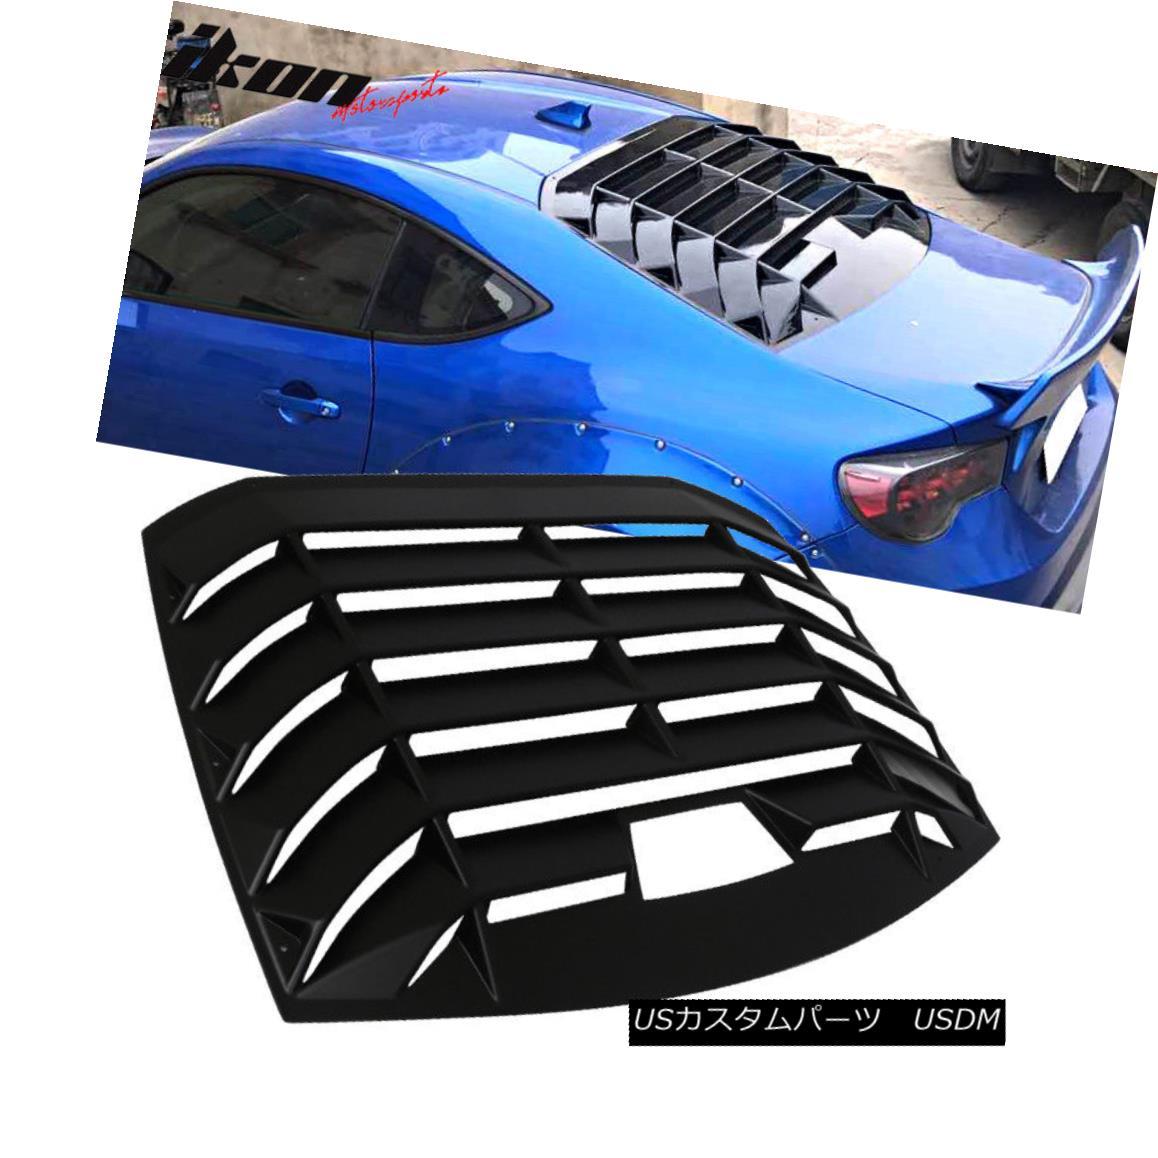 Ikonスタイルのリアウィンドウシールドルーバーアブ Scion 13-18 Frs Brz Louver For Shield Abs 13-18 Ikon エアロパーツ Window Subaru Brz Style Scion FrsのためにSubaru Rear